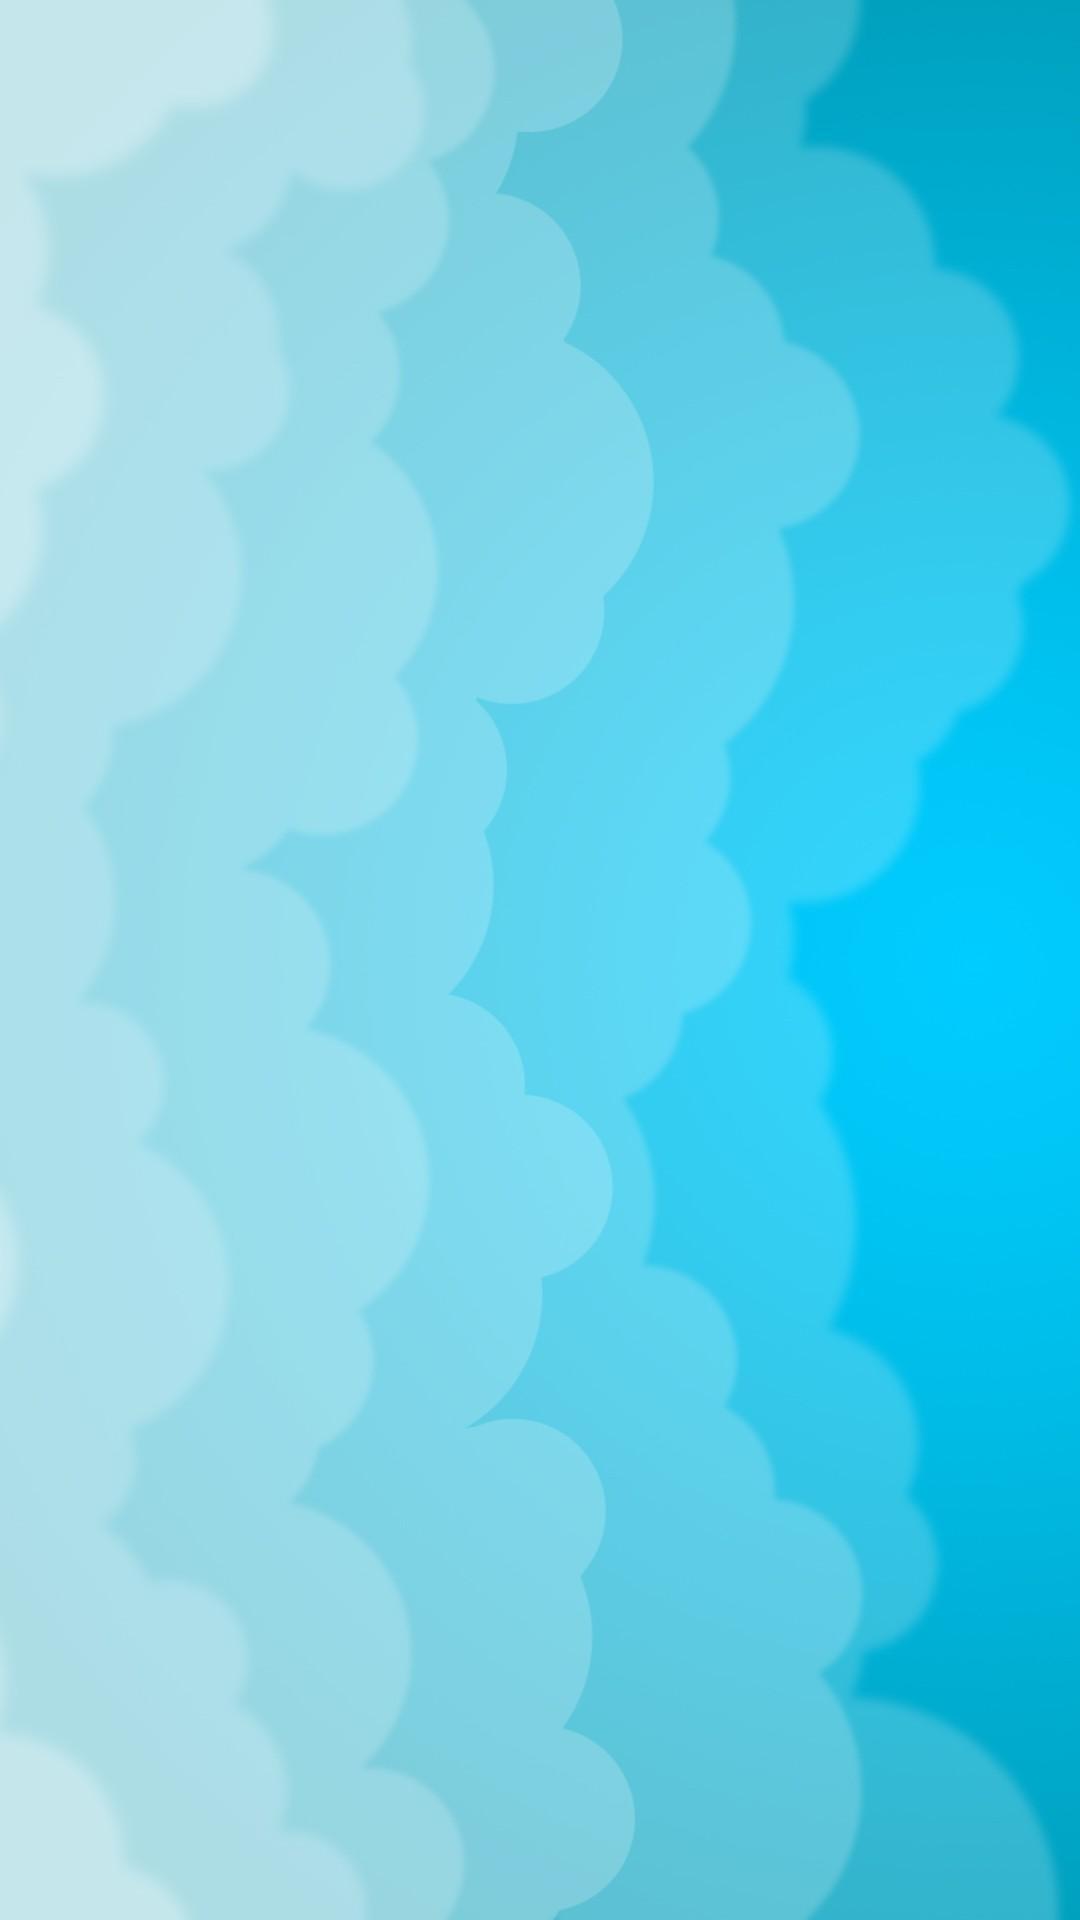 Blue Wallpaper iPhone 7 Plus 2019 3D iPhone Wallpaper 1080x1920